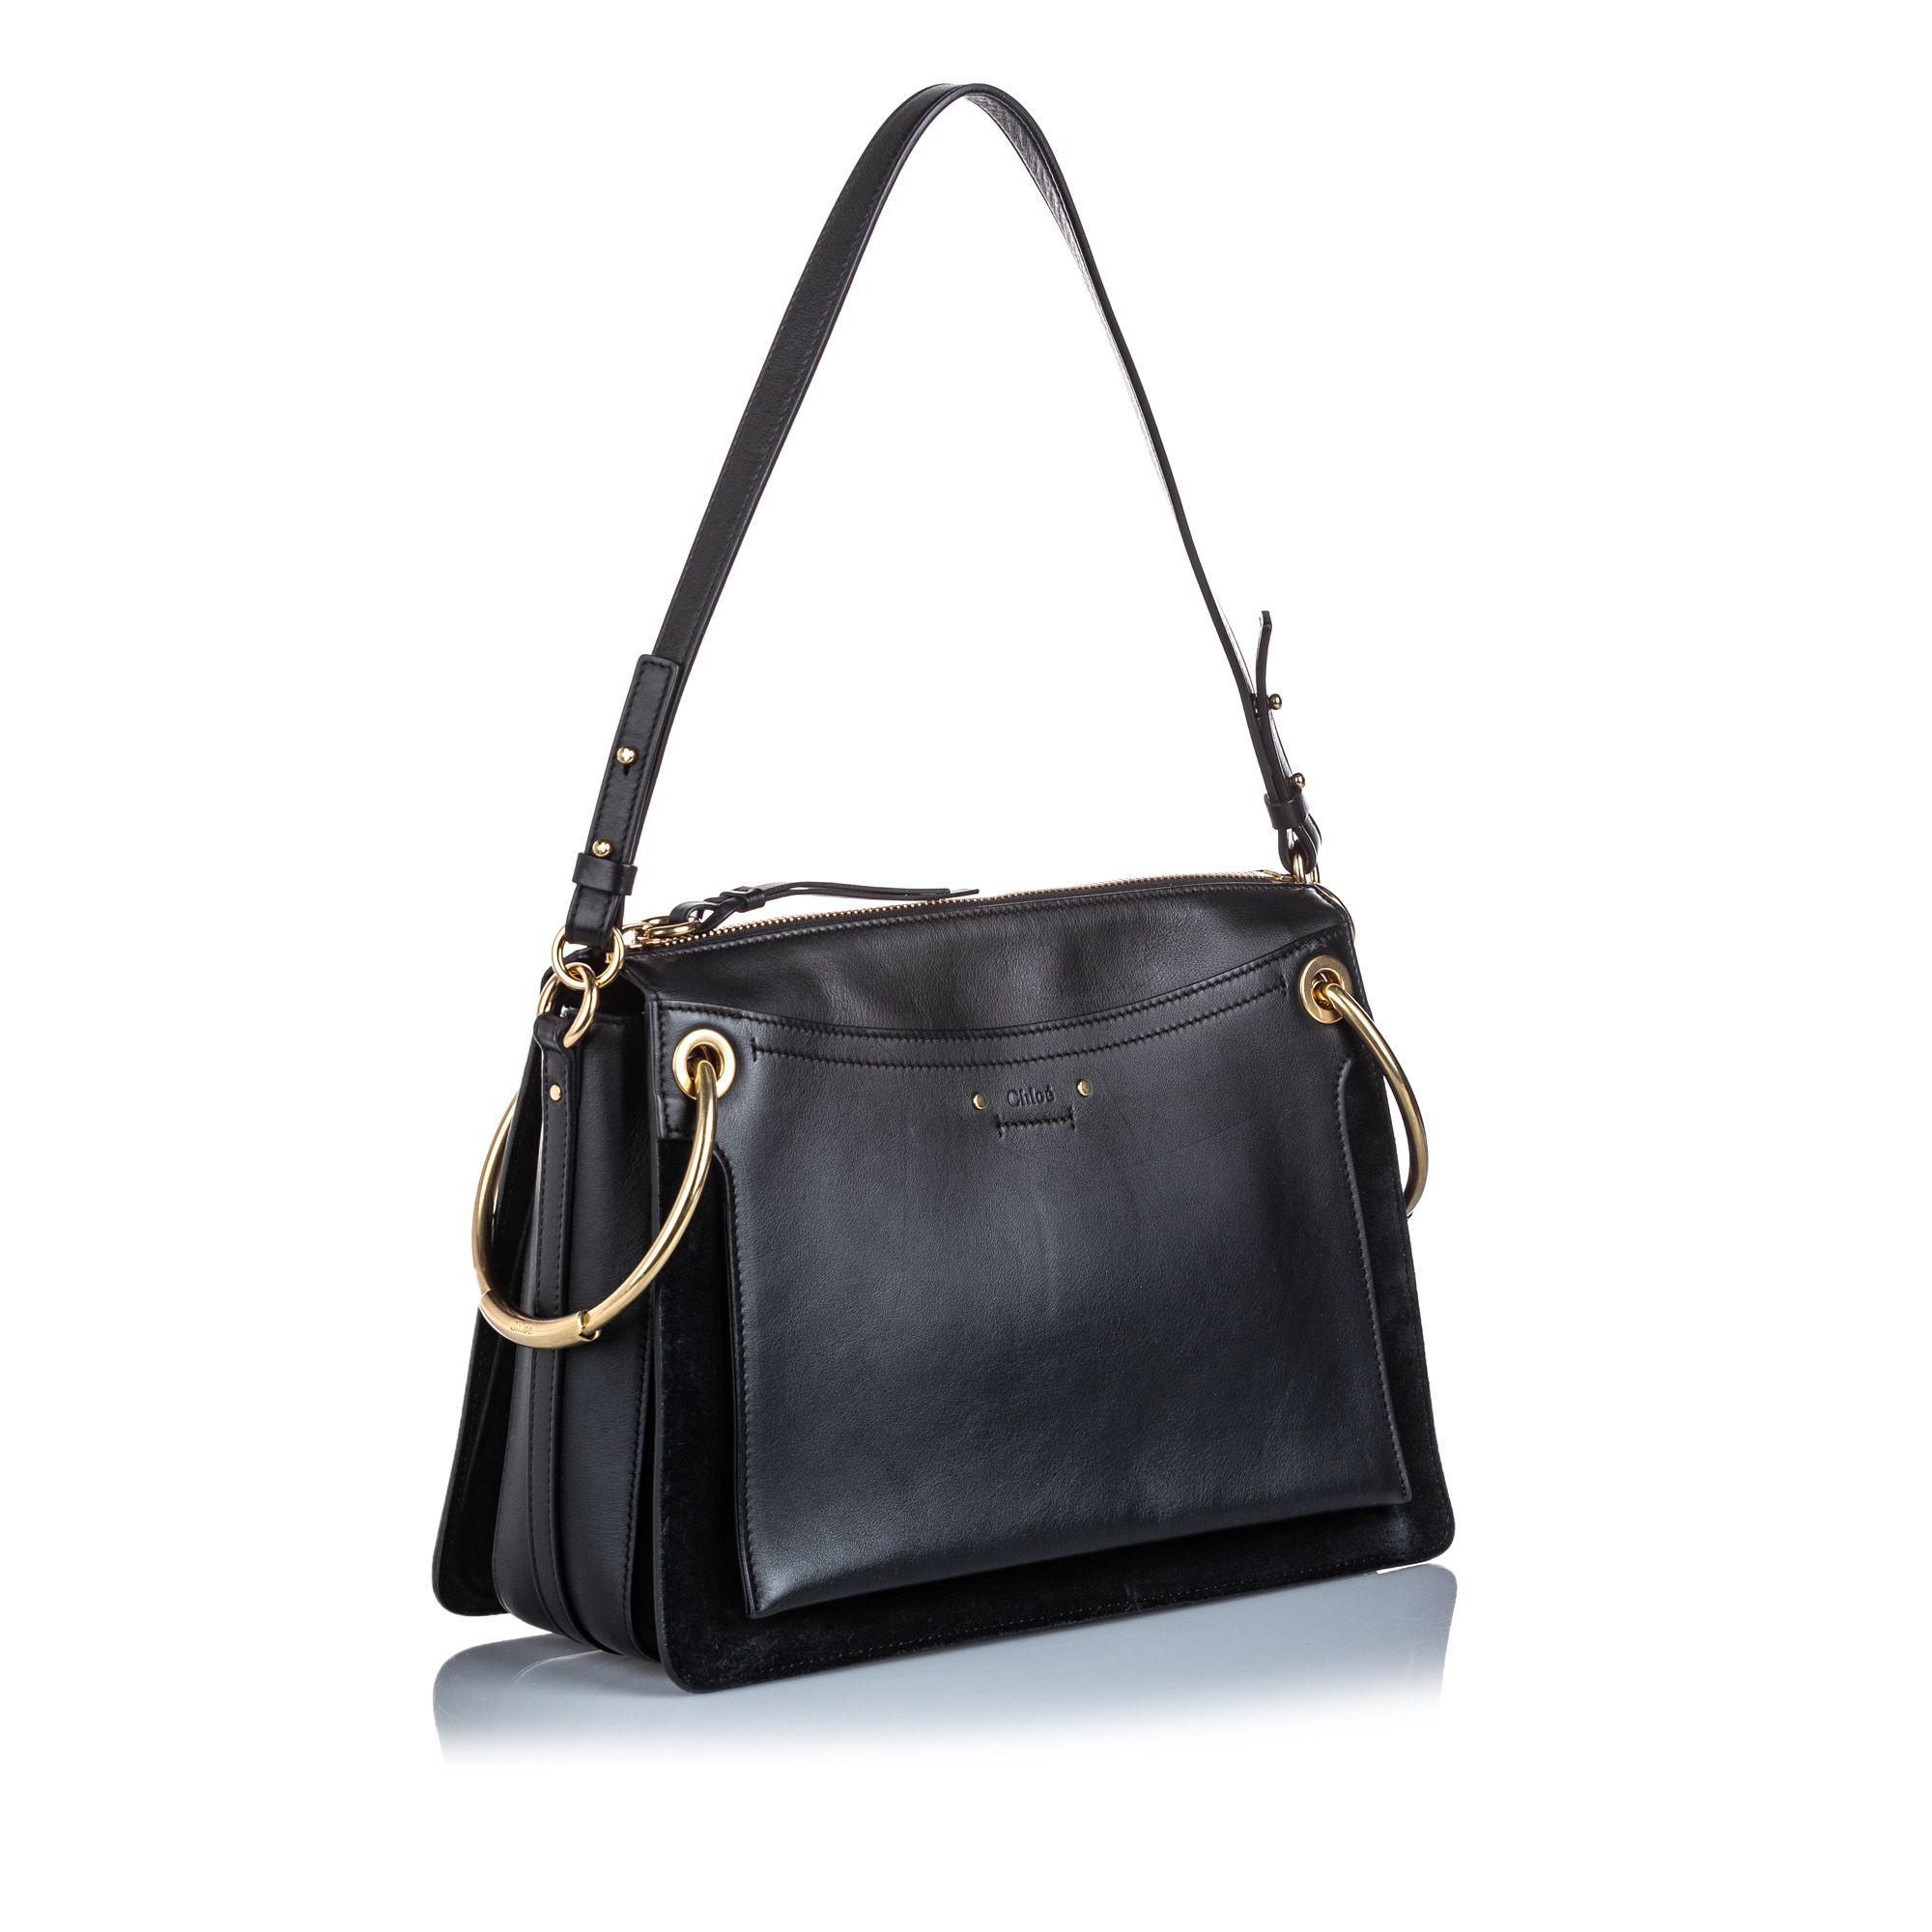 Vintage Chloe Medium Leather Roy Satchel Black